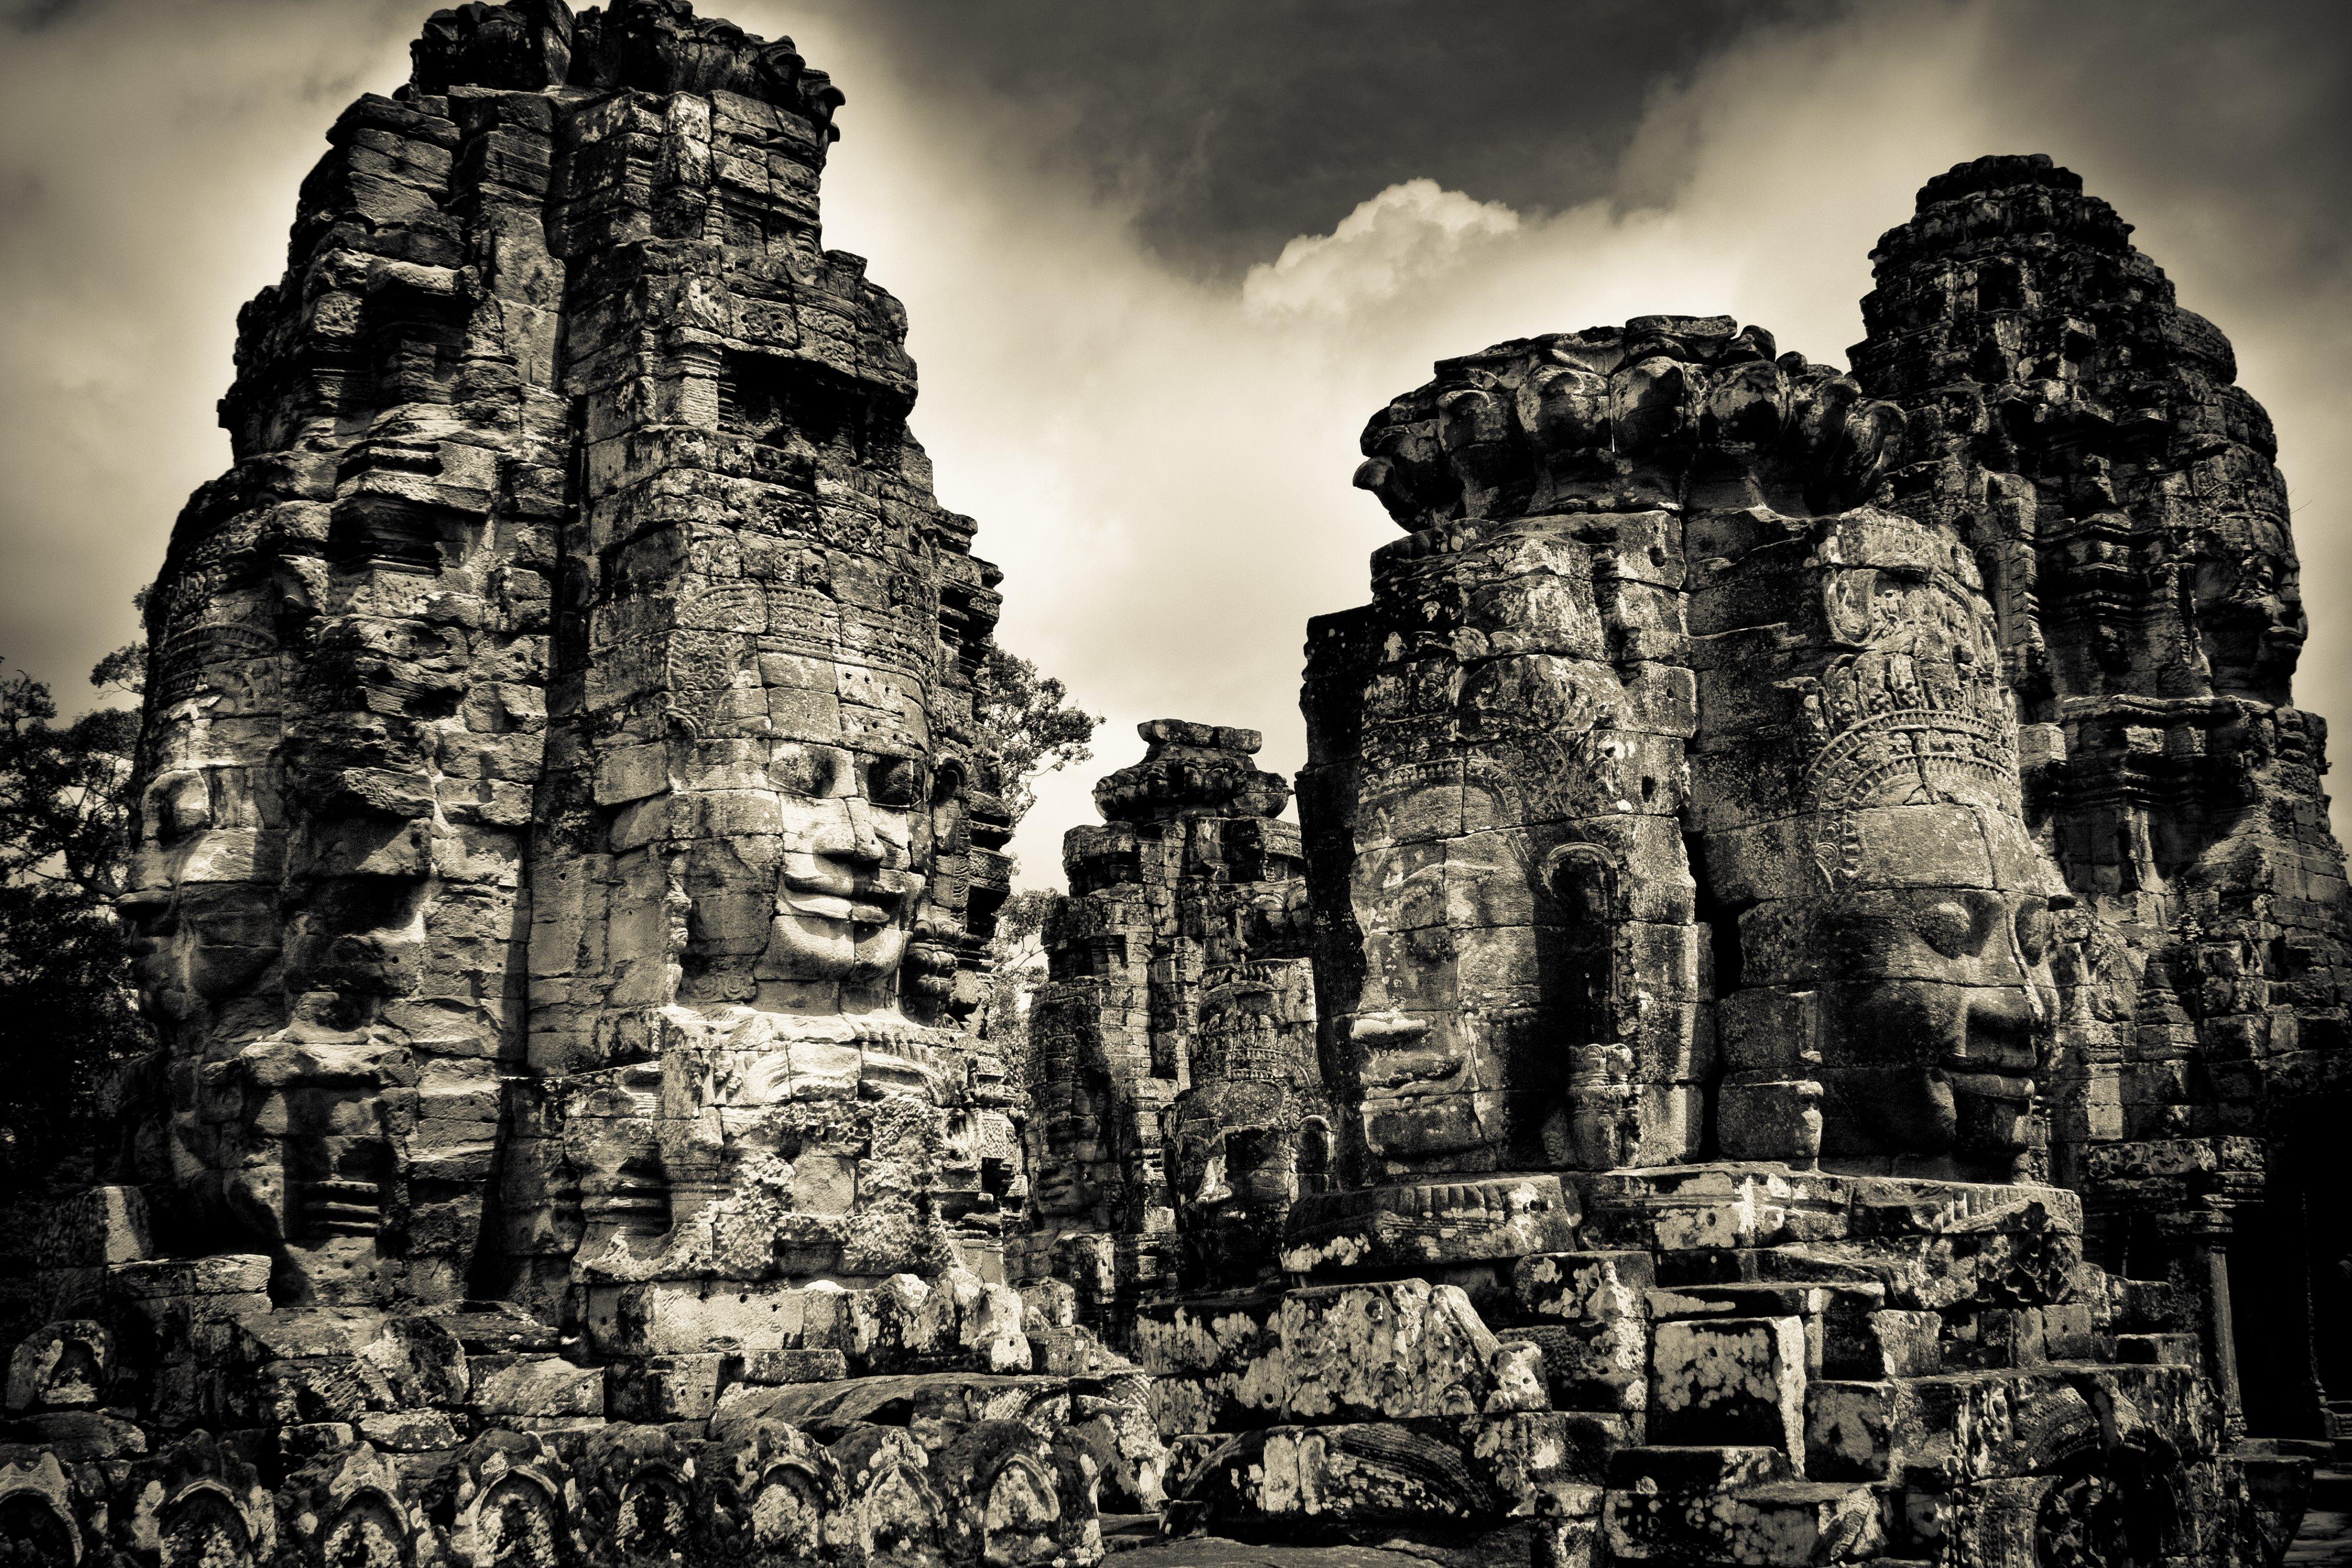 Faces of Bayon Temple